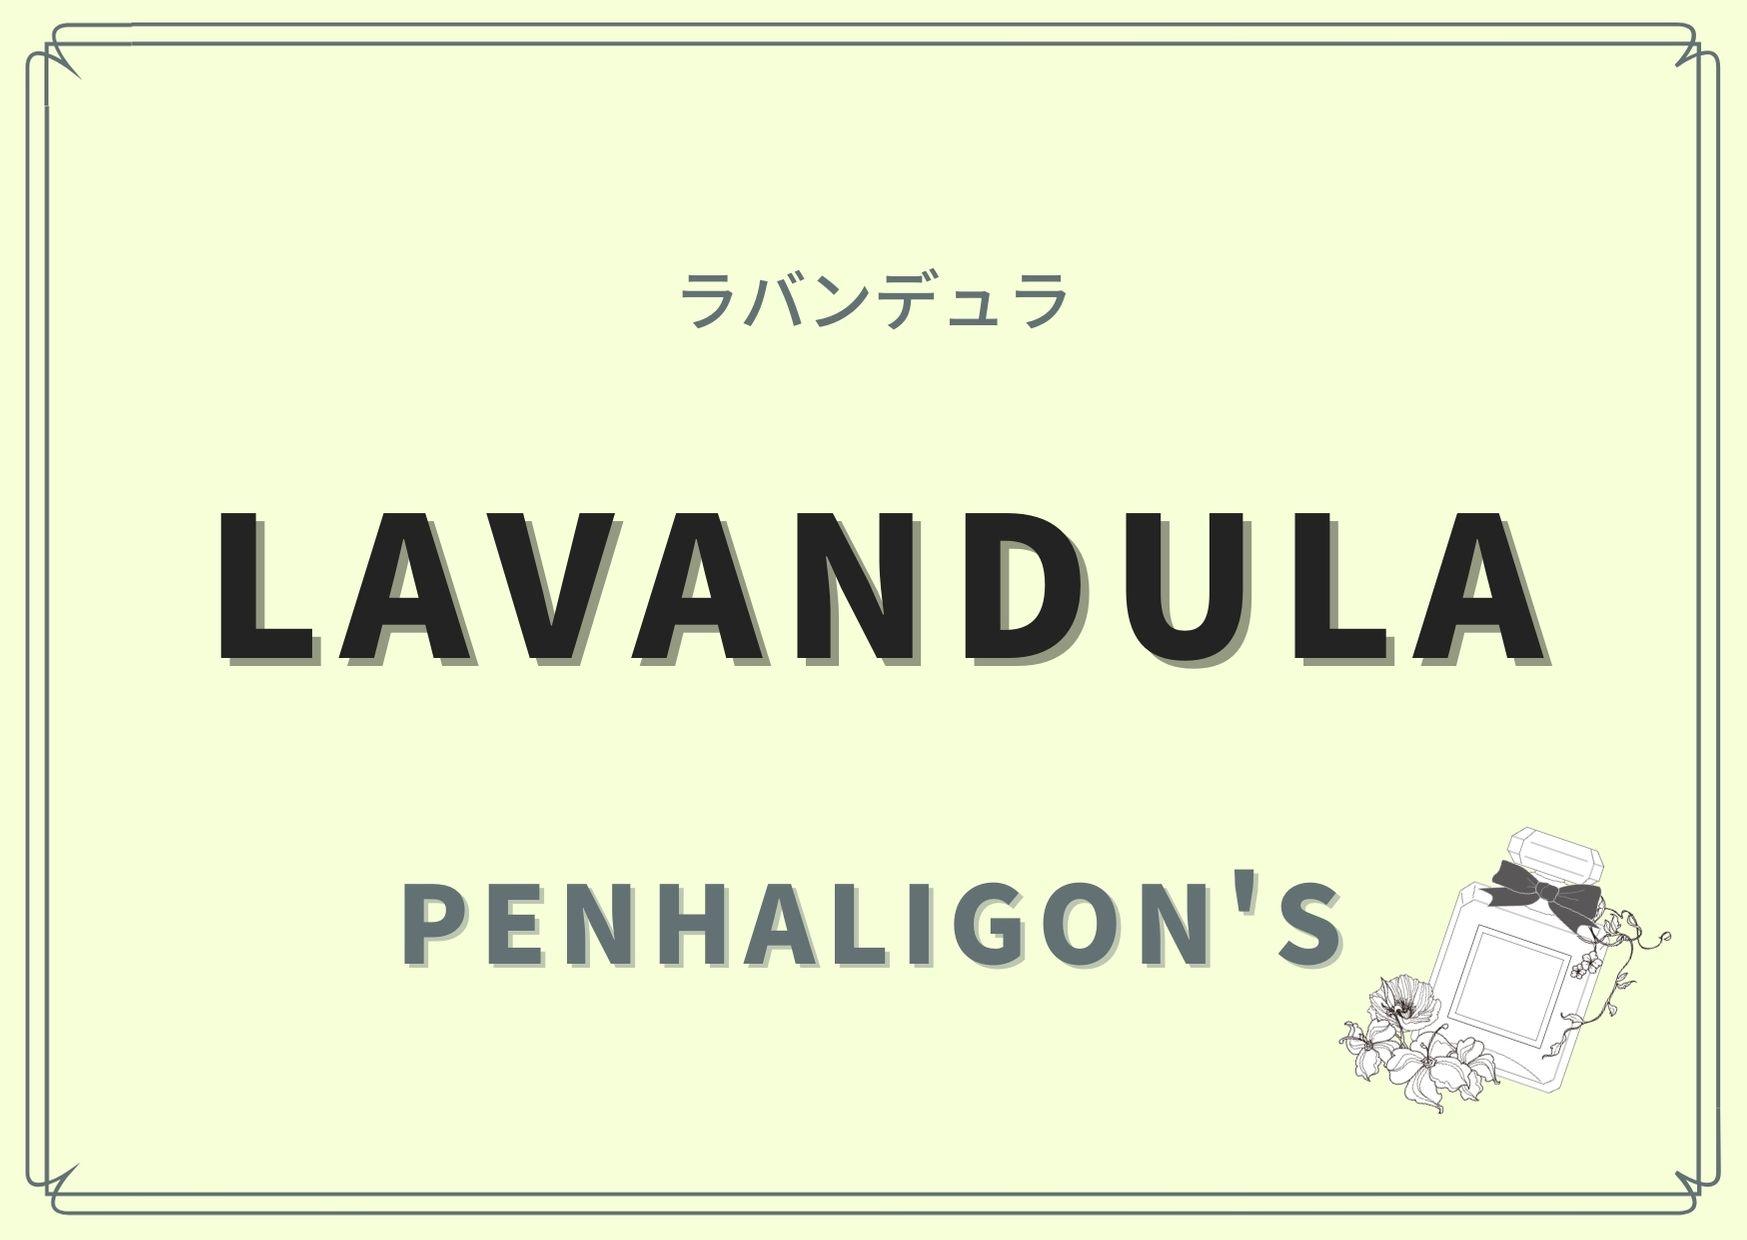 LAVANDULA(ラバンデュラ)/PENHALIGON'S(ペンハリガン)